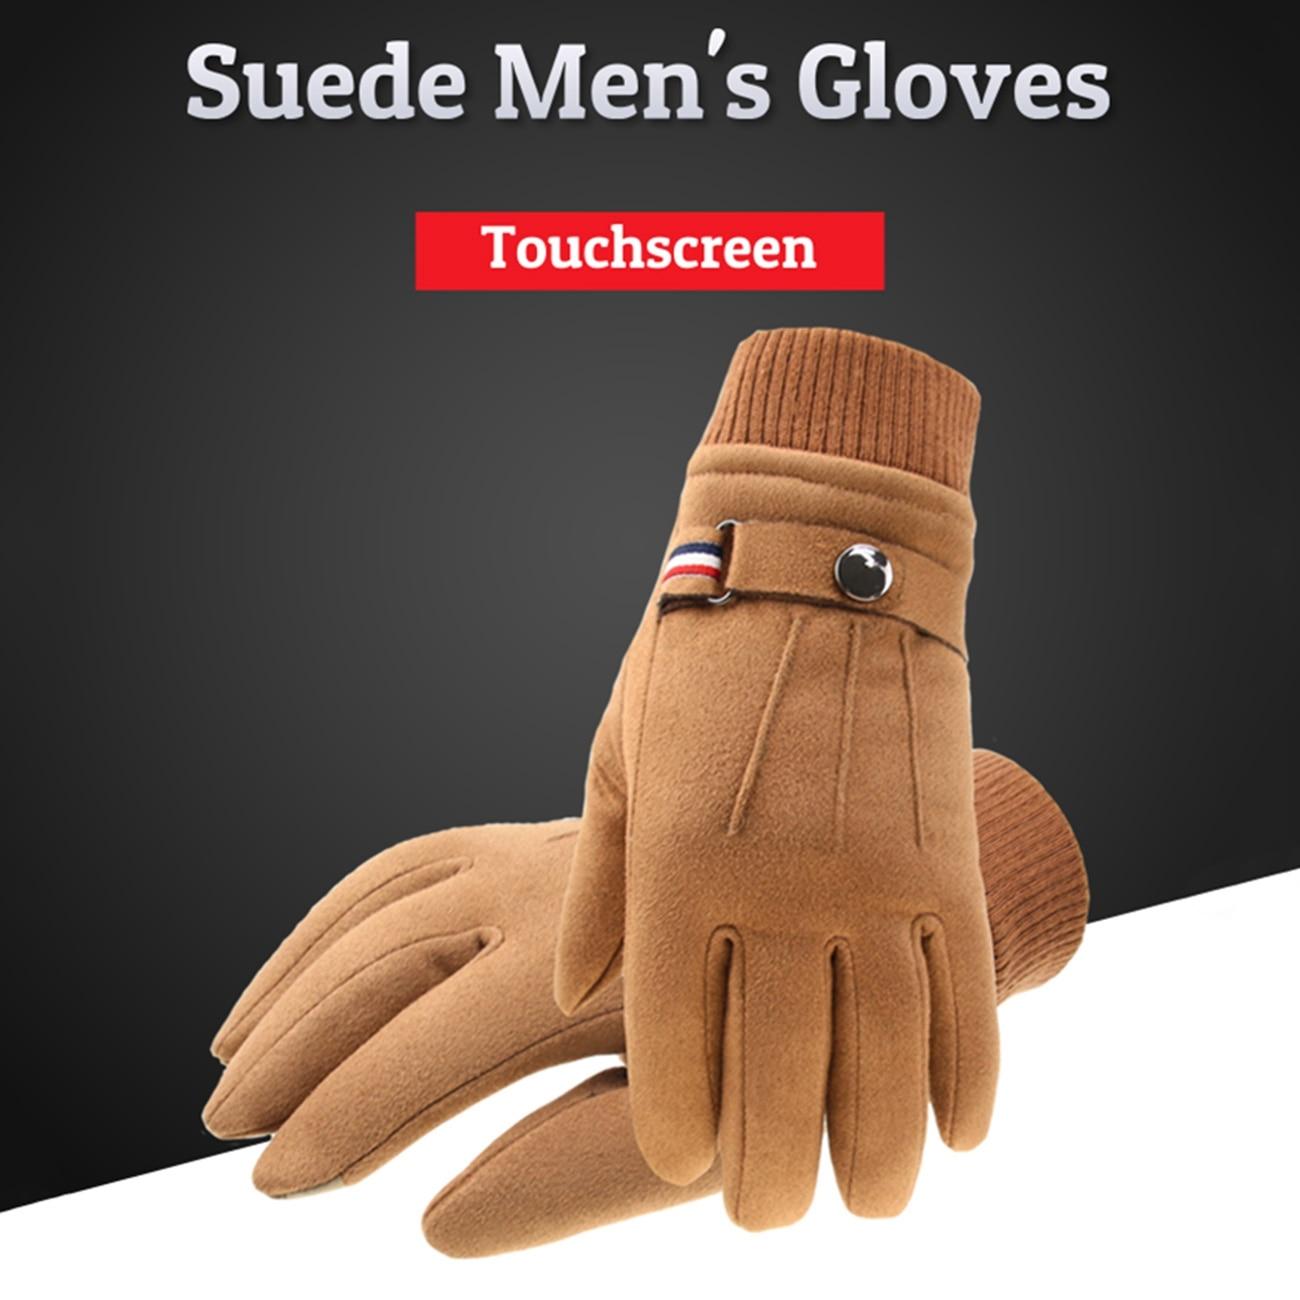 Men'S Winter Gloves Suede Warm Split Finger Gloves Outdoor Sport Driving Buckle Design Male Touc